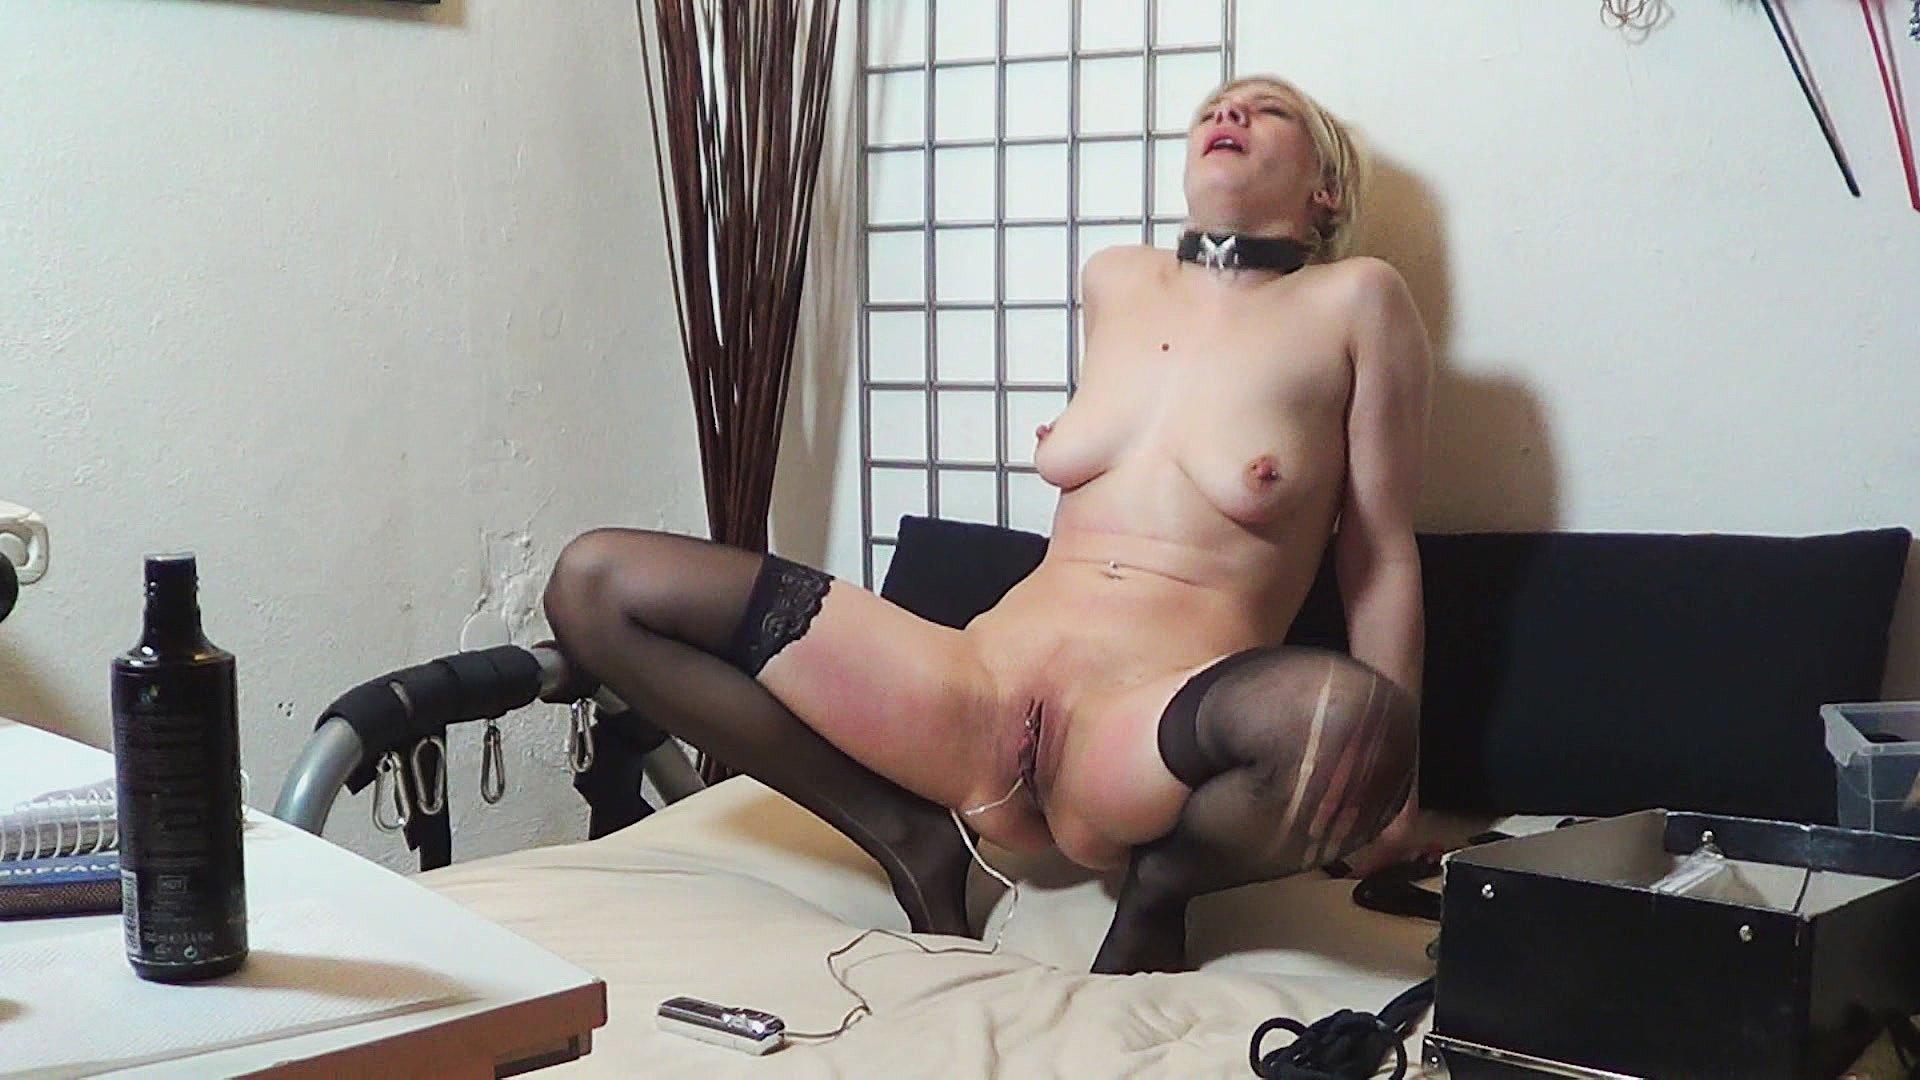 porn video 2020 Face to face sex position